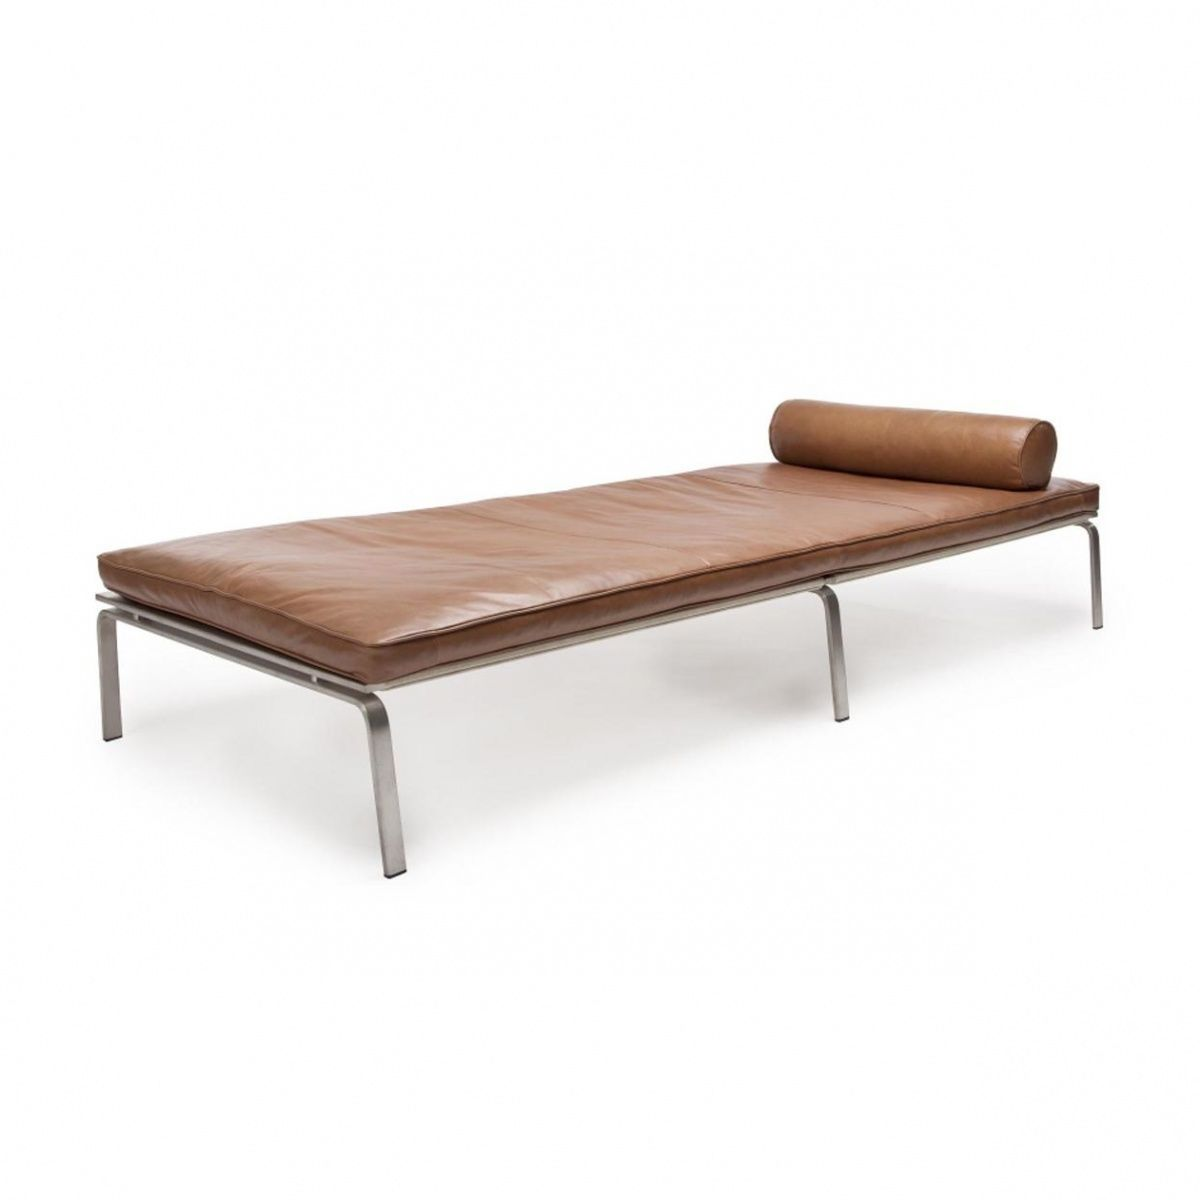 Norr 11 Man Lounge Daybed Liege Cognac Braun Geb Rstet Leder  # Foxy Muebles Y Objetos